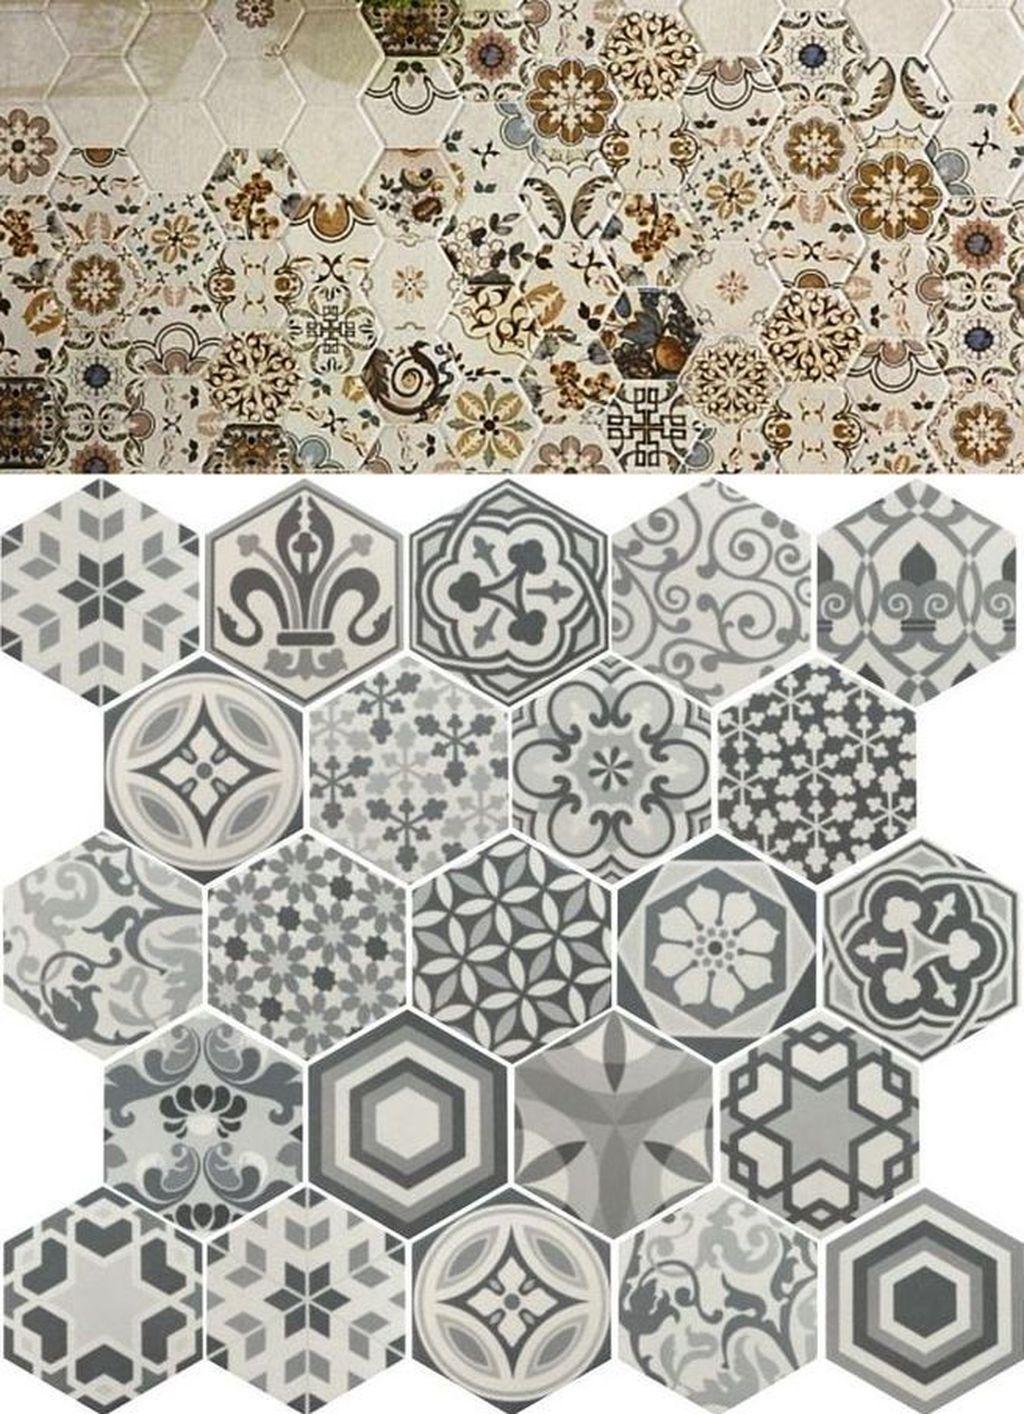 Superb Glitter Kitchen Tiles Design Ideas To Try Nowaday 32